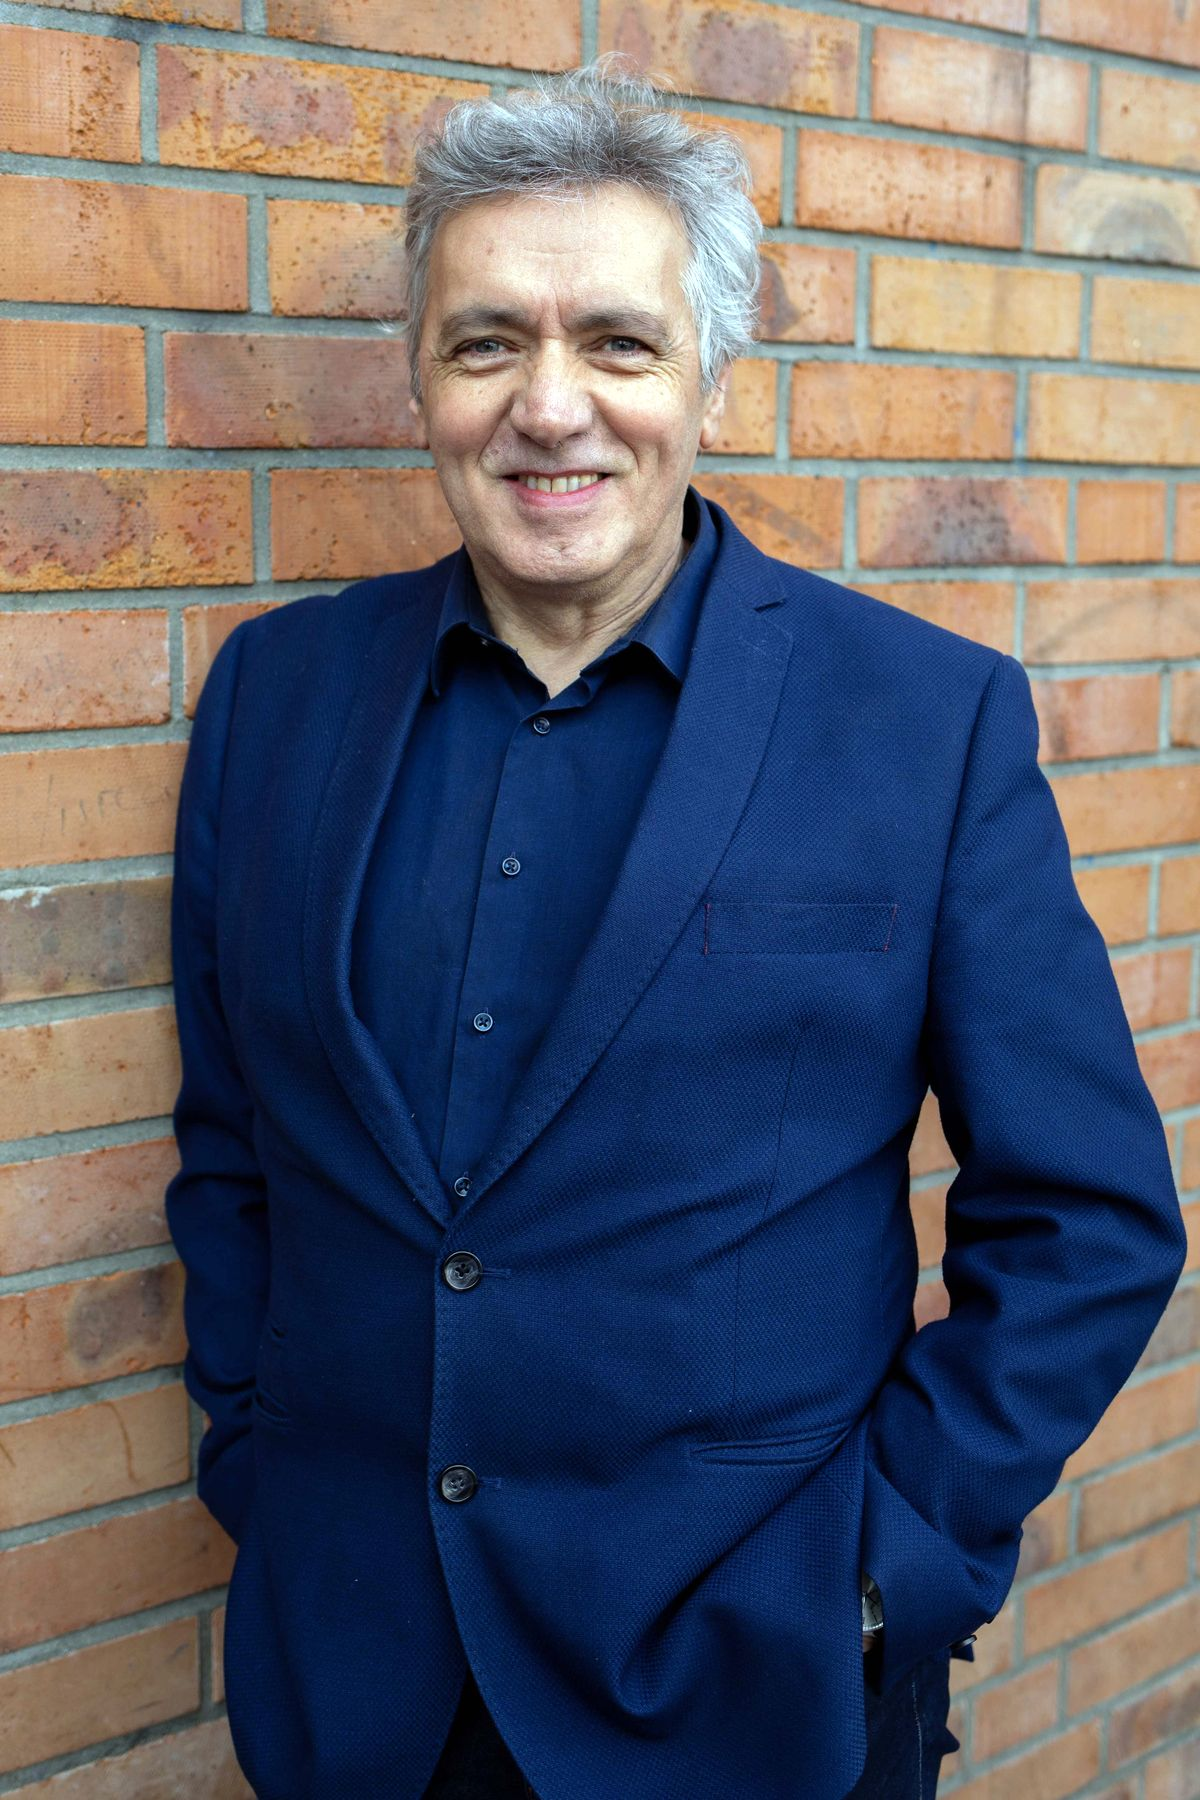 Harald Kahl, 1. Ratsmitglied